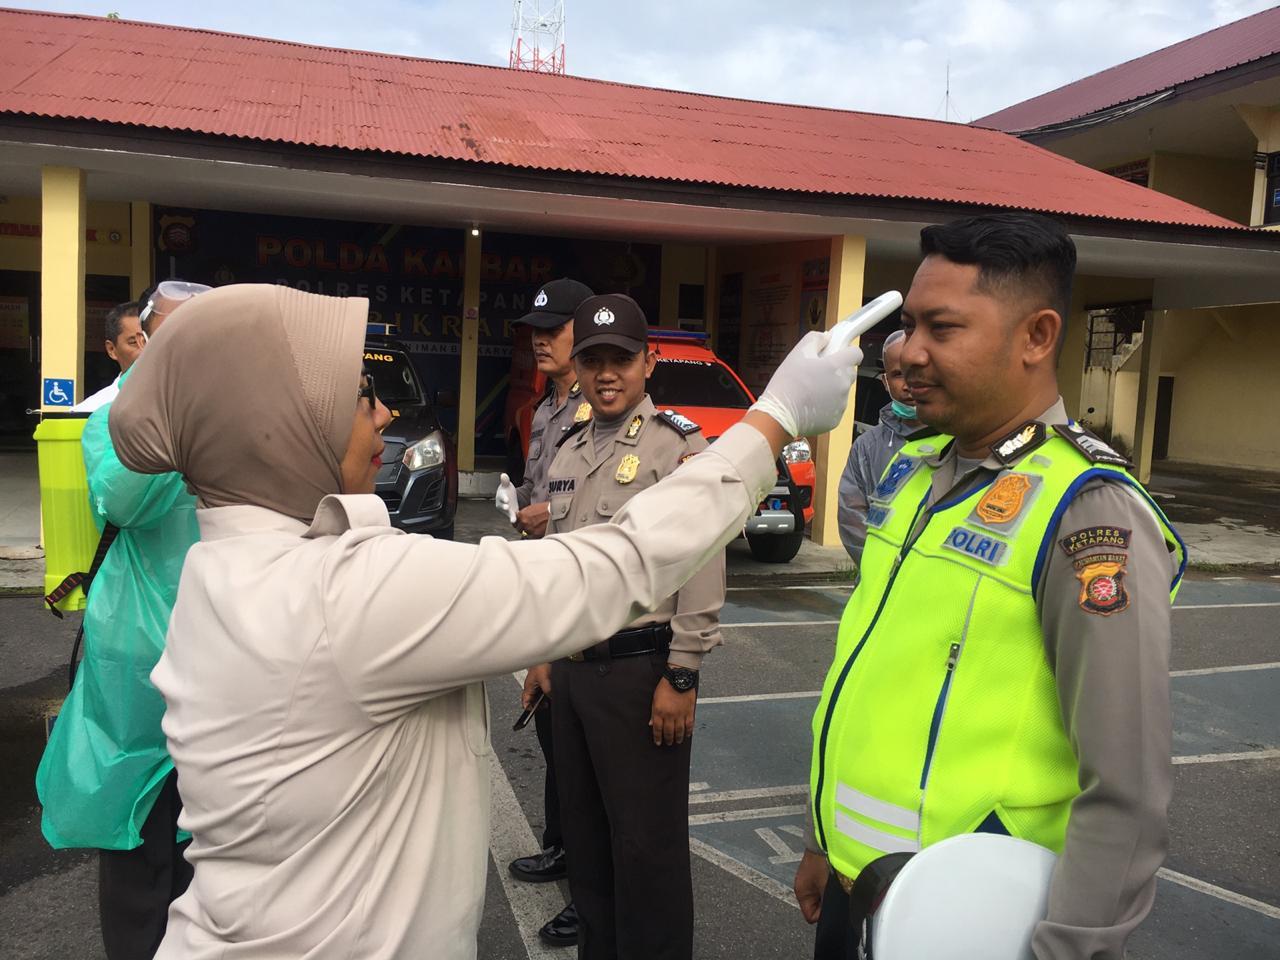 Cek Suhu Tubuh, Satlantas Polres Ketapang Pastikan Anggotanya Bebas Suspect Covid-19